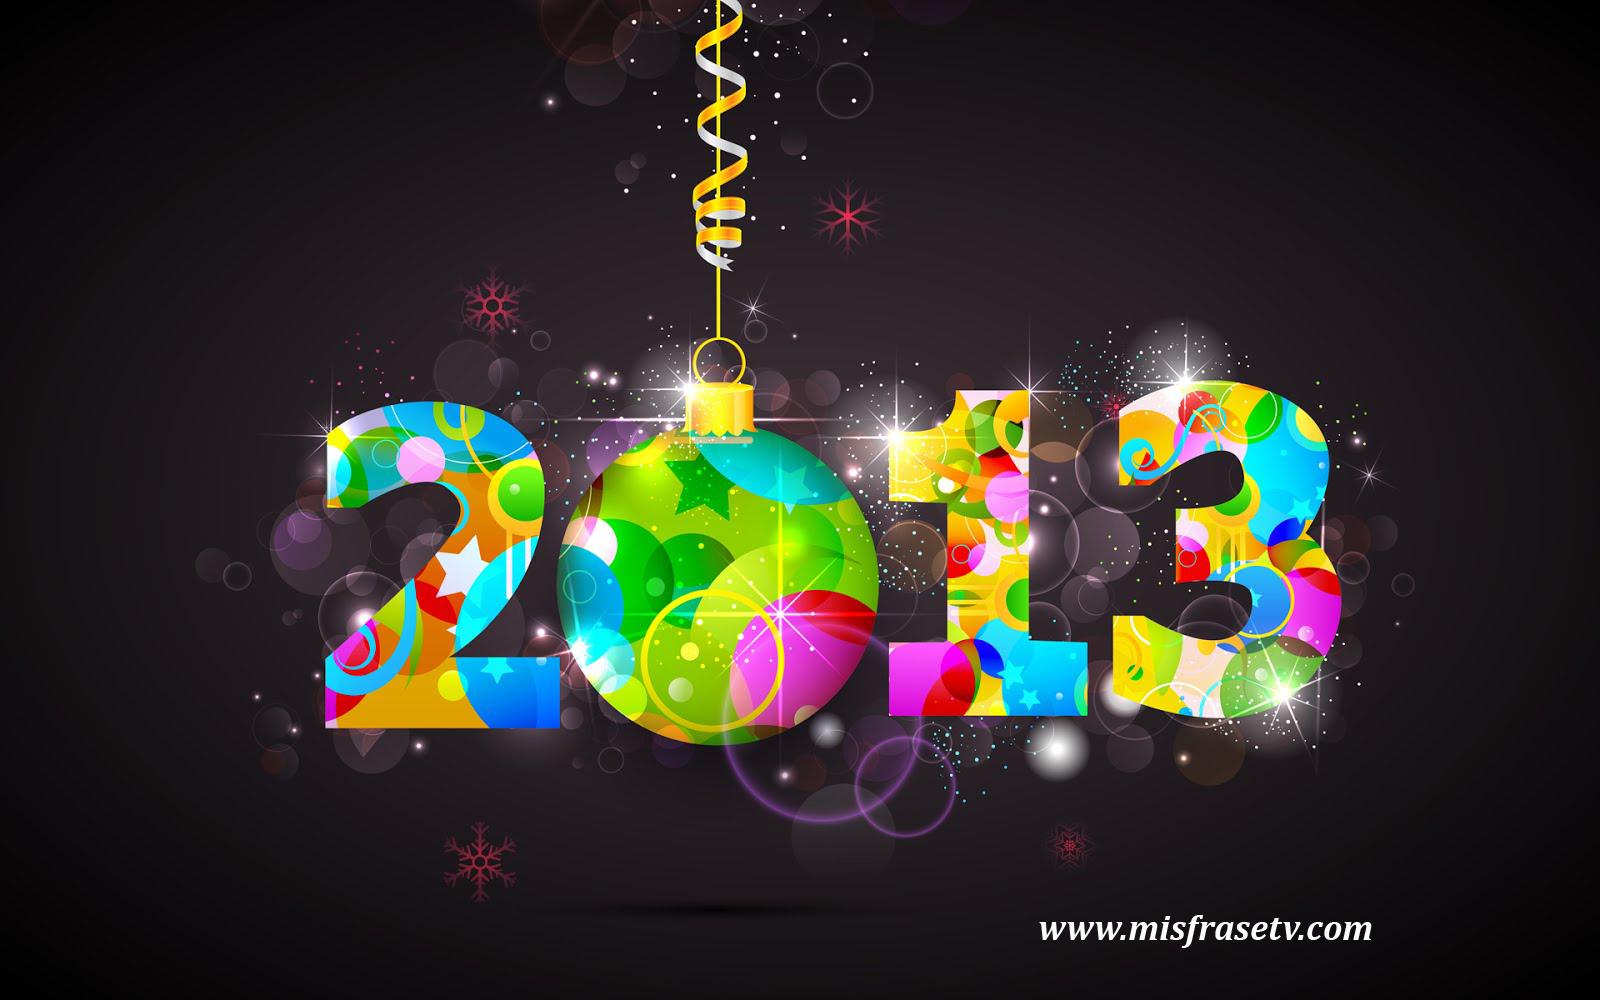 http://4.bp.blogspot.com/-cuo0mbYfnVM/UOHp-ieNo6I/AAAAAAAAApE/ZMhJtiMk5mg/s1600/imagenes-fondos-y-postales-para-compartir-gratis-en-a%C3%B1o-nuevo-2013-new-year-wallpapers-10.jpg